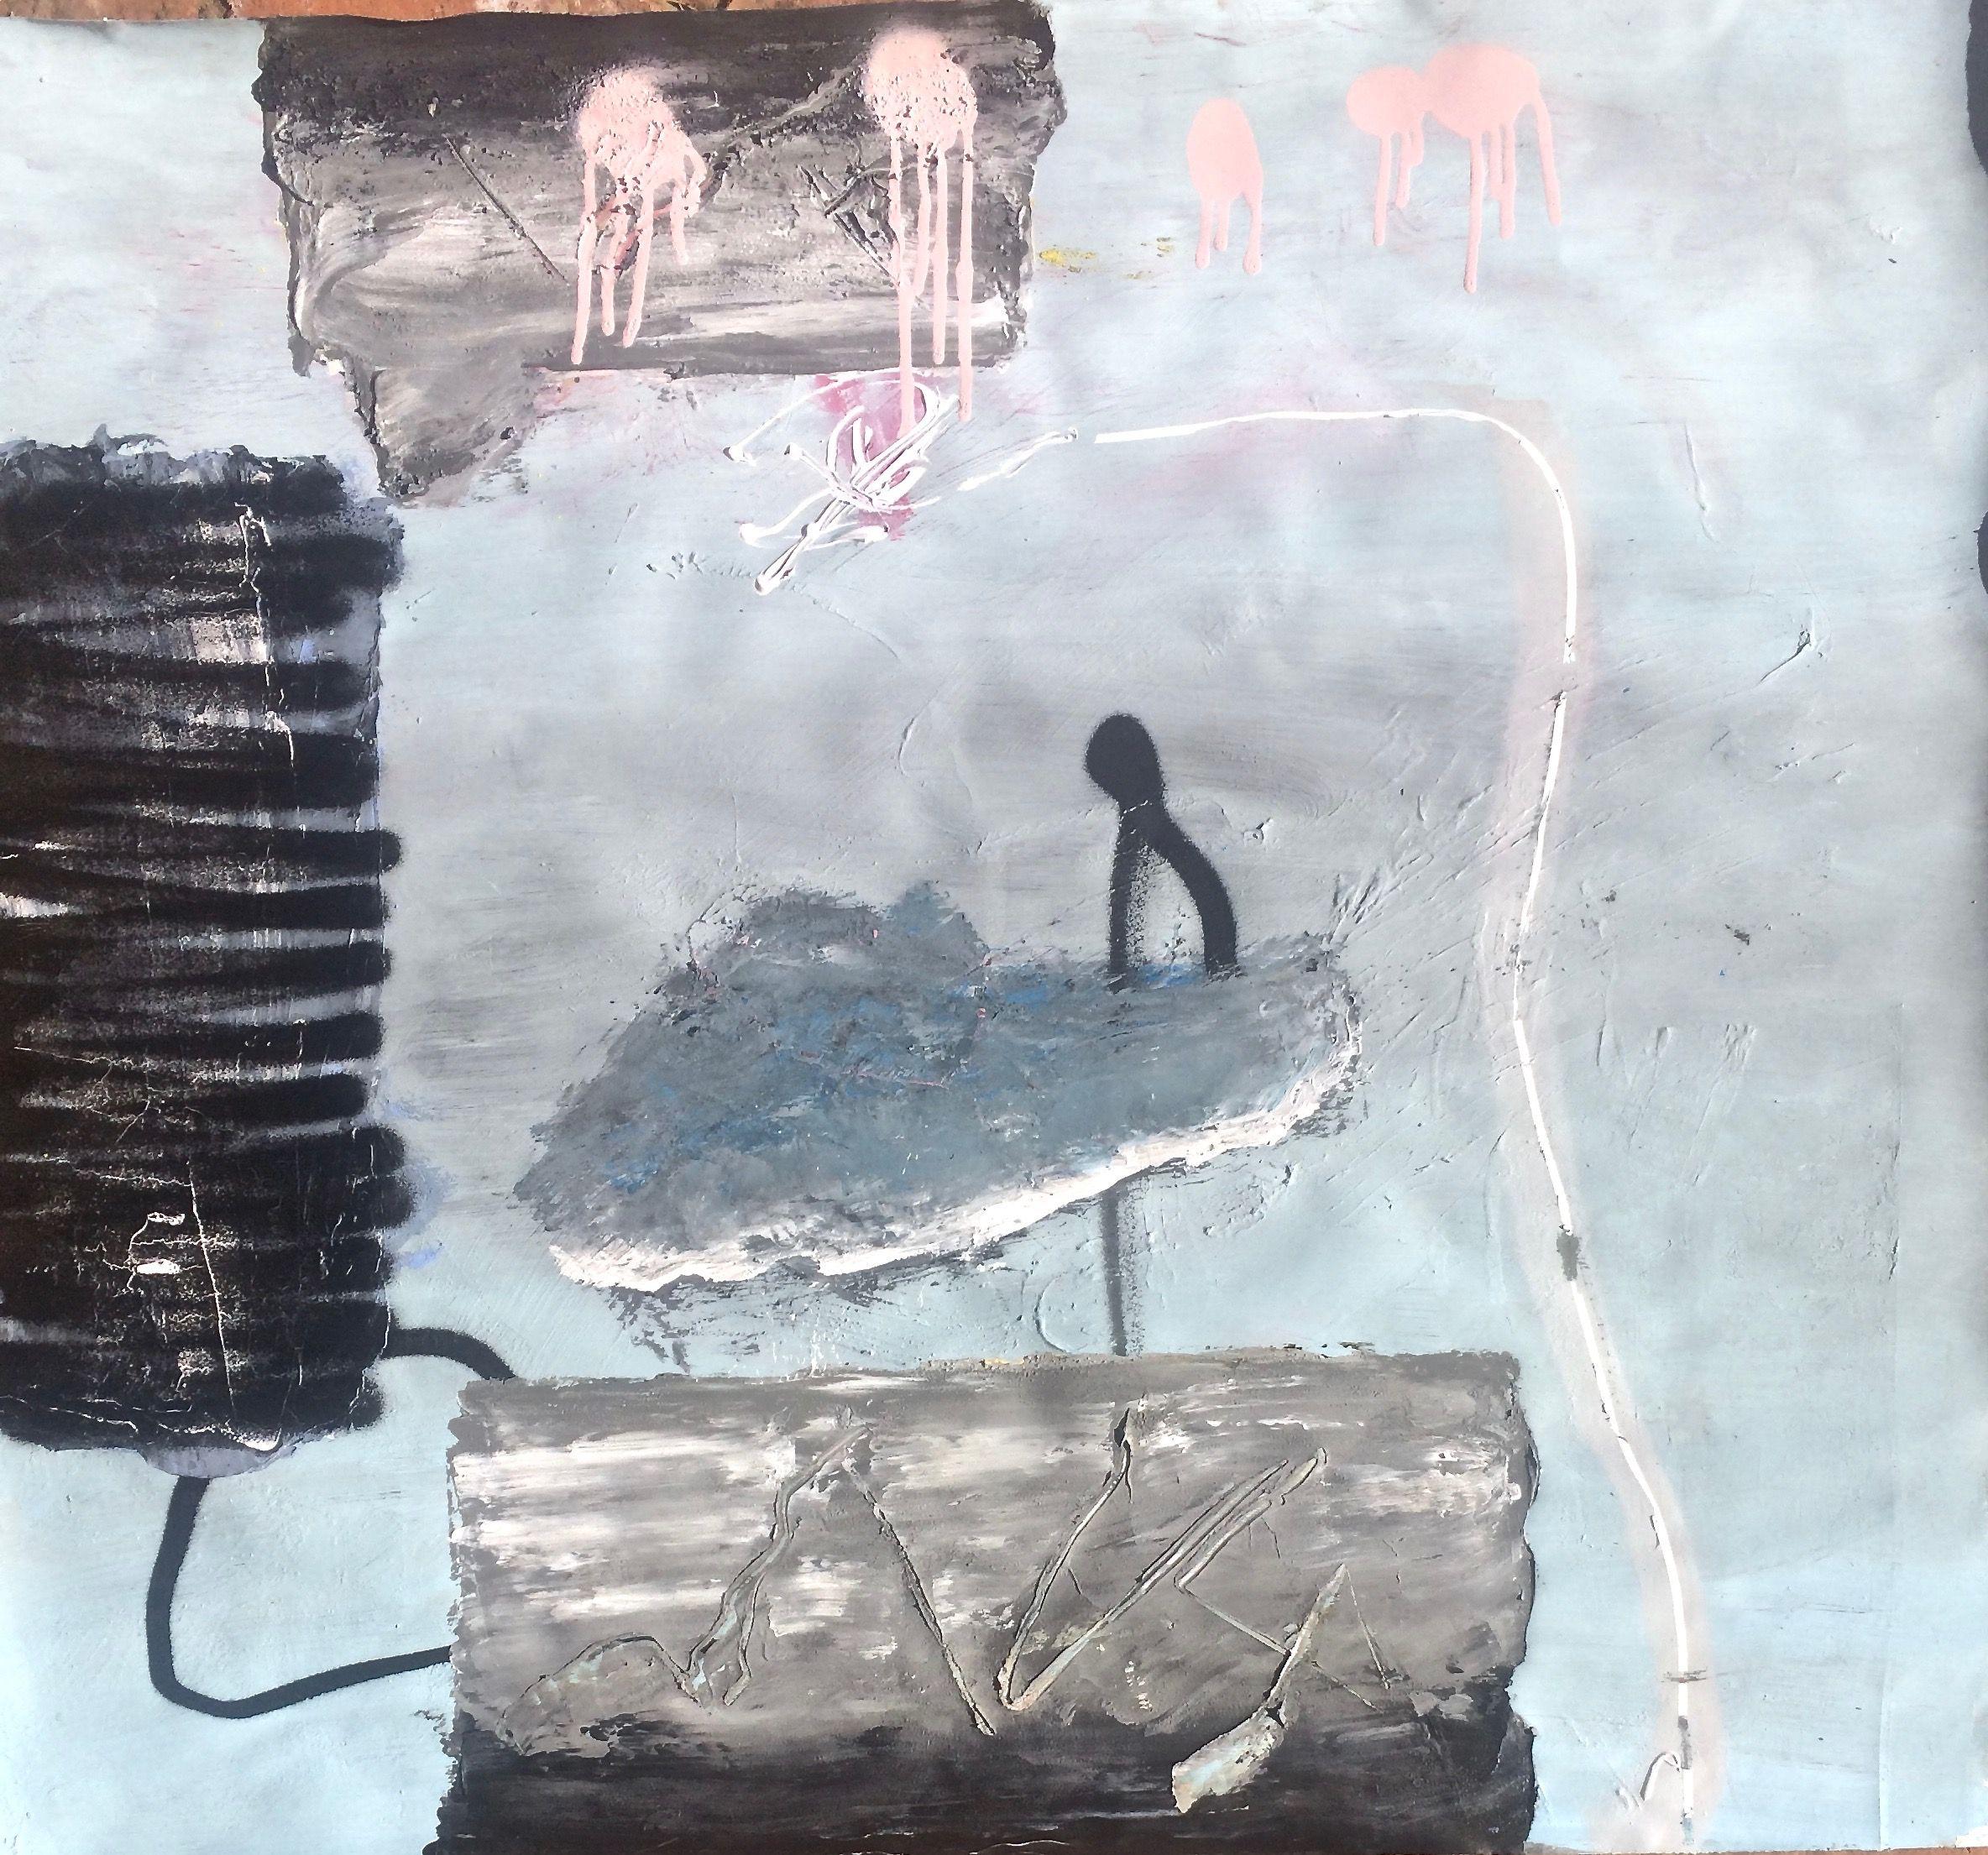 Jordi Galí - Déjà loin (01-2018) 1,03x0,92m. Acrylic Spray on paper